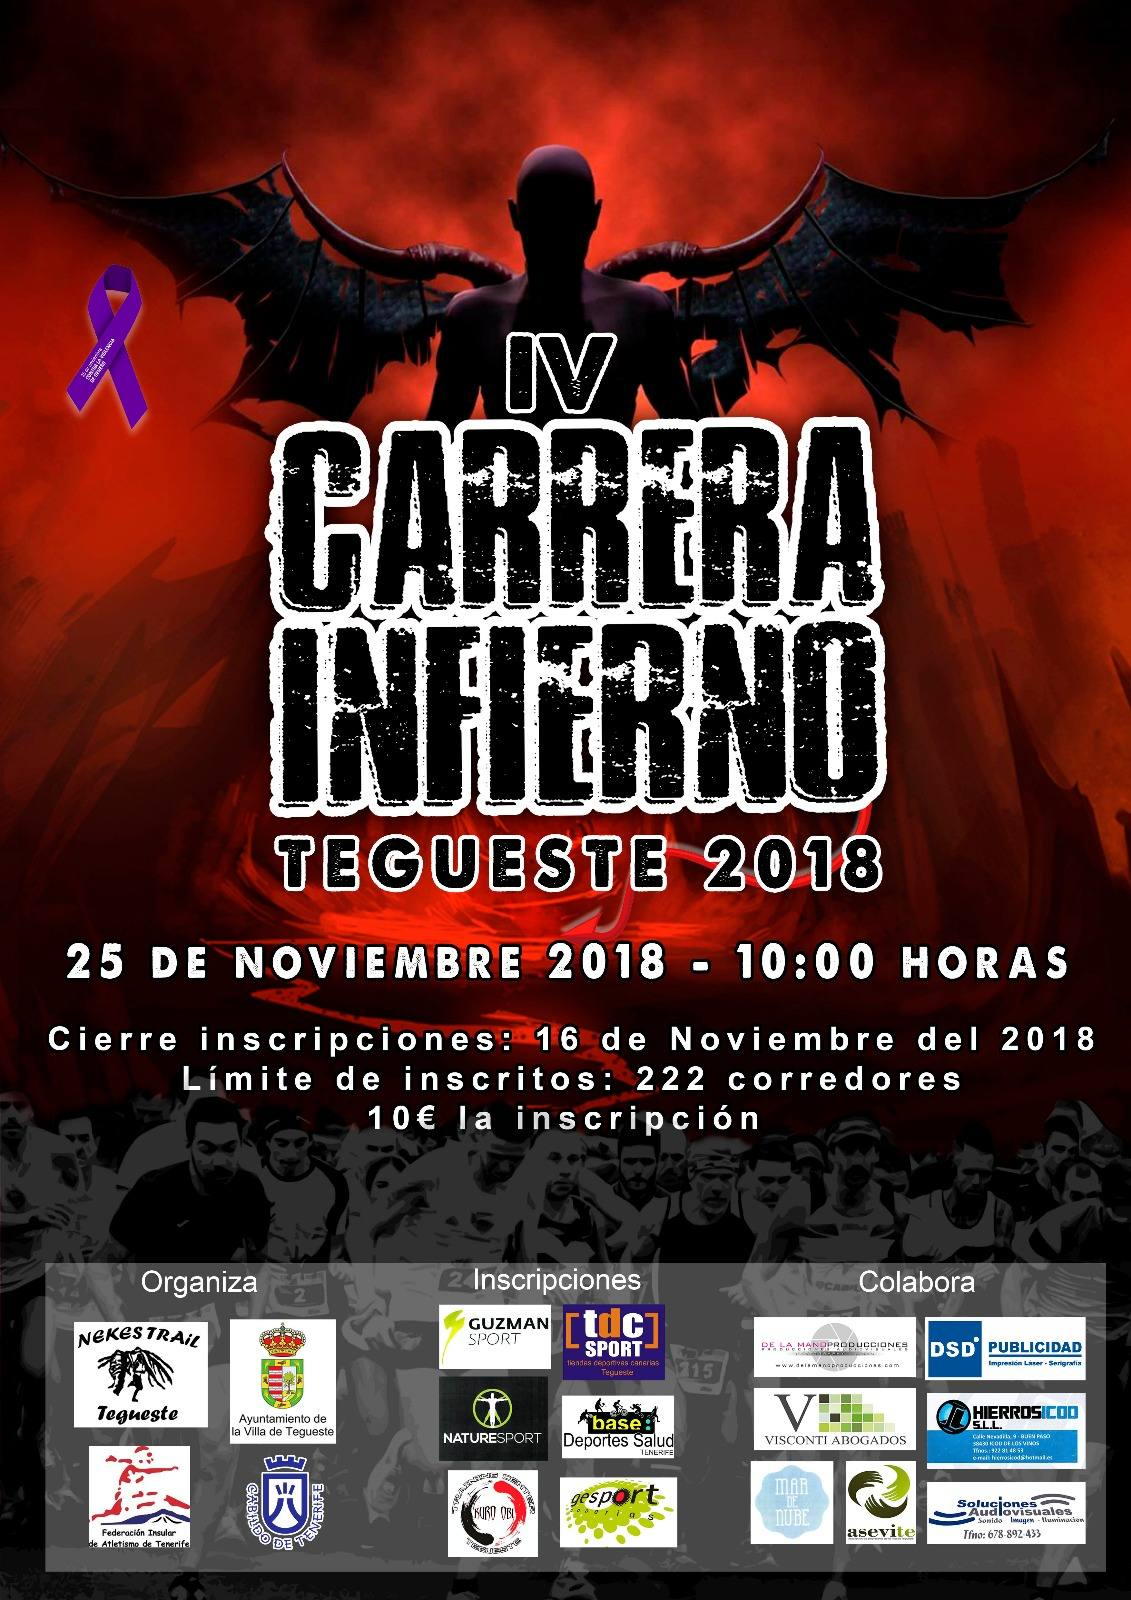 IV CARRERA INFIERNO TEGUESTE - Inscríbete